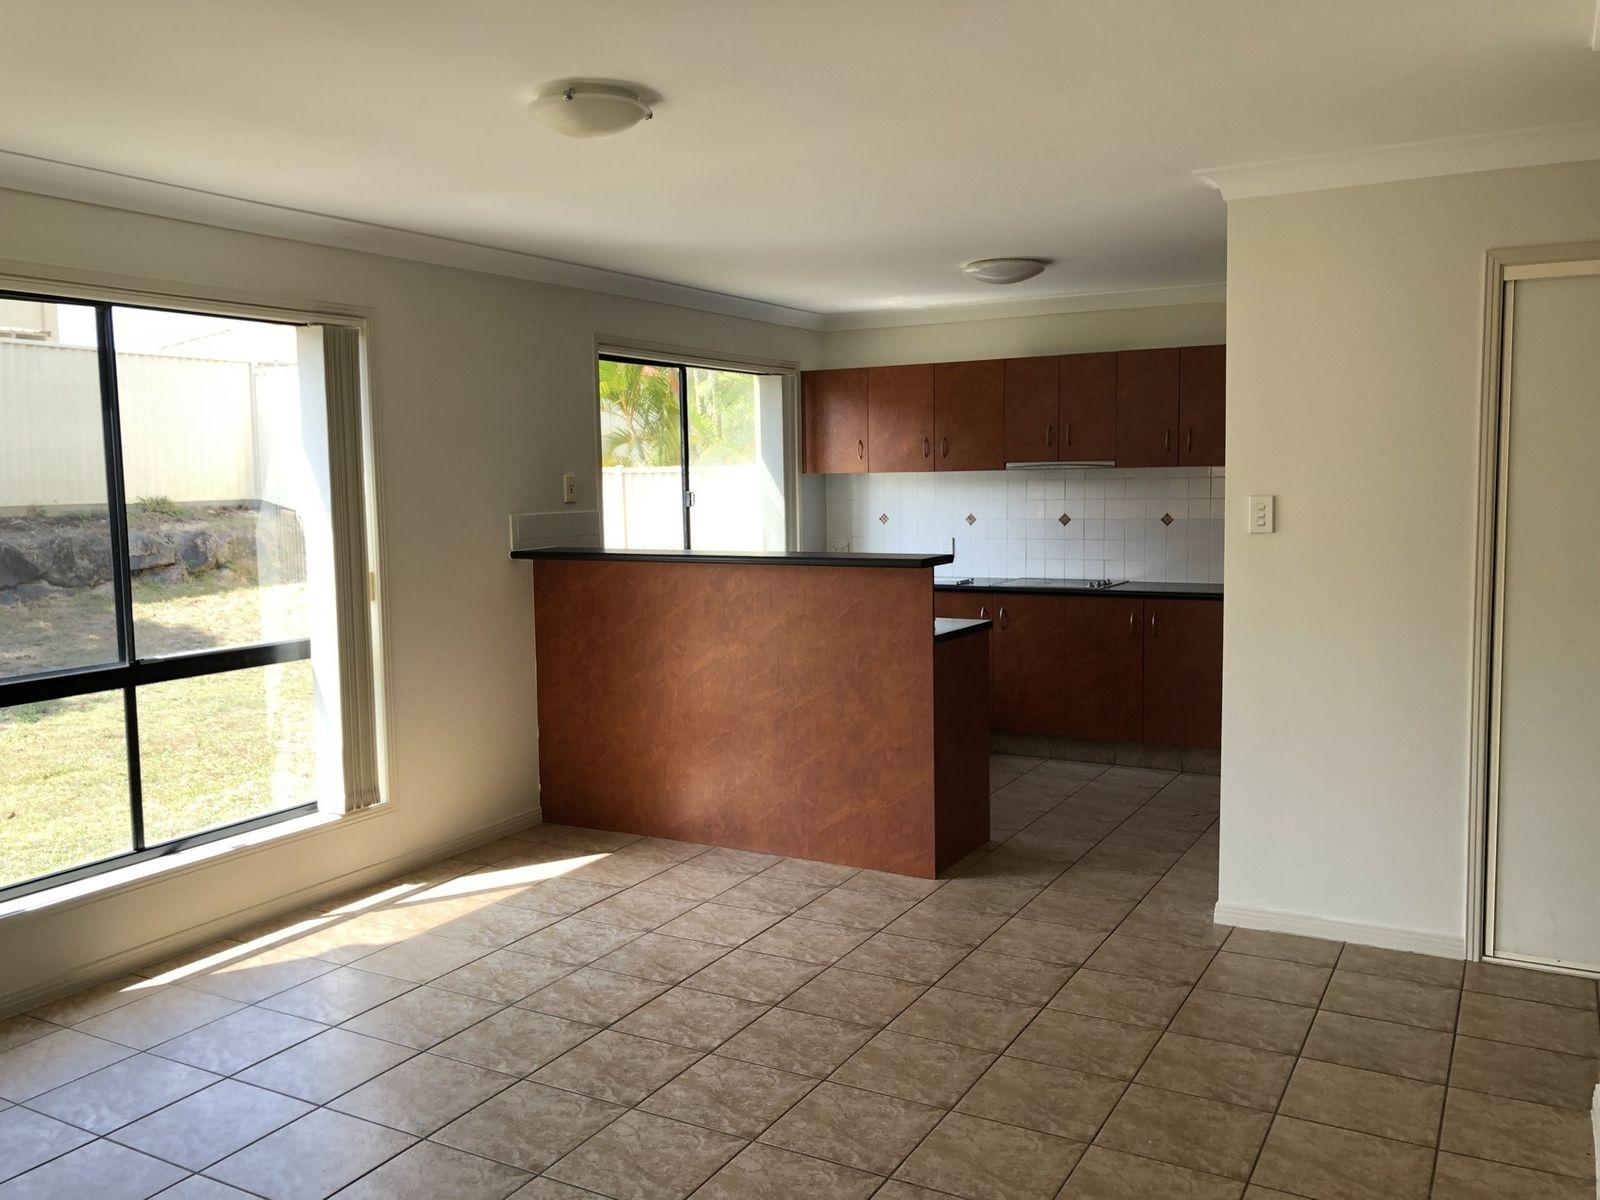 19 Tanzen Drive, Arundel, QLD 4214